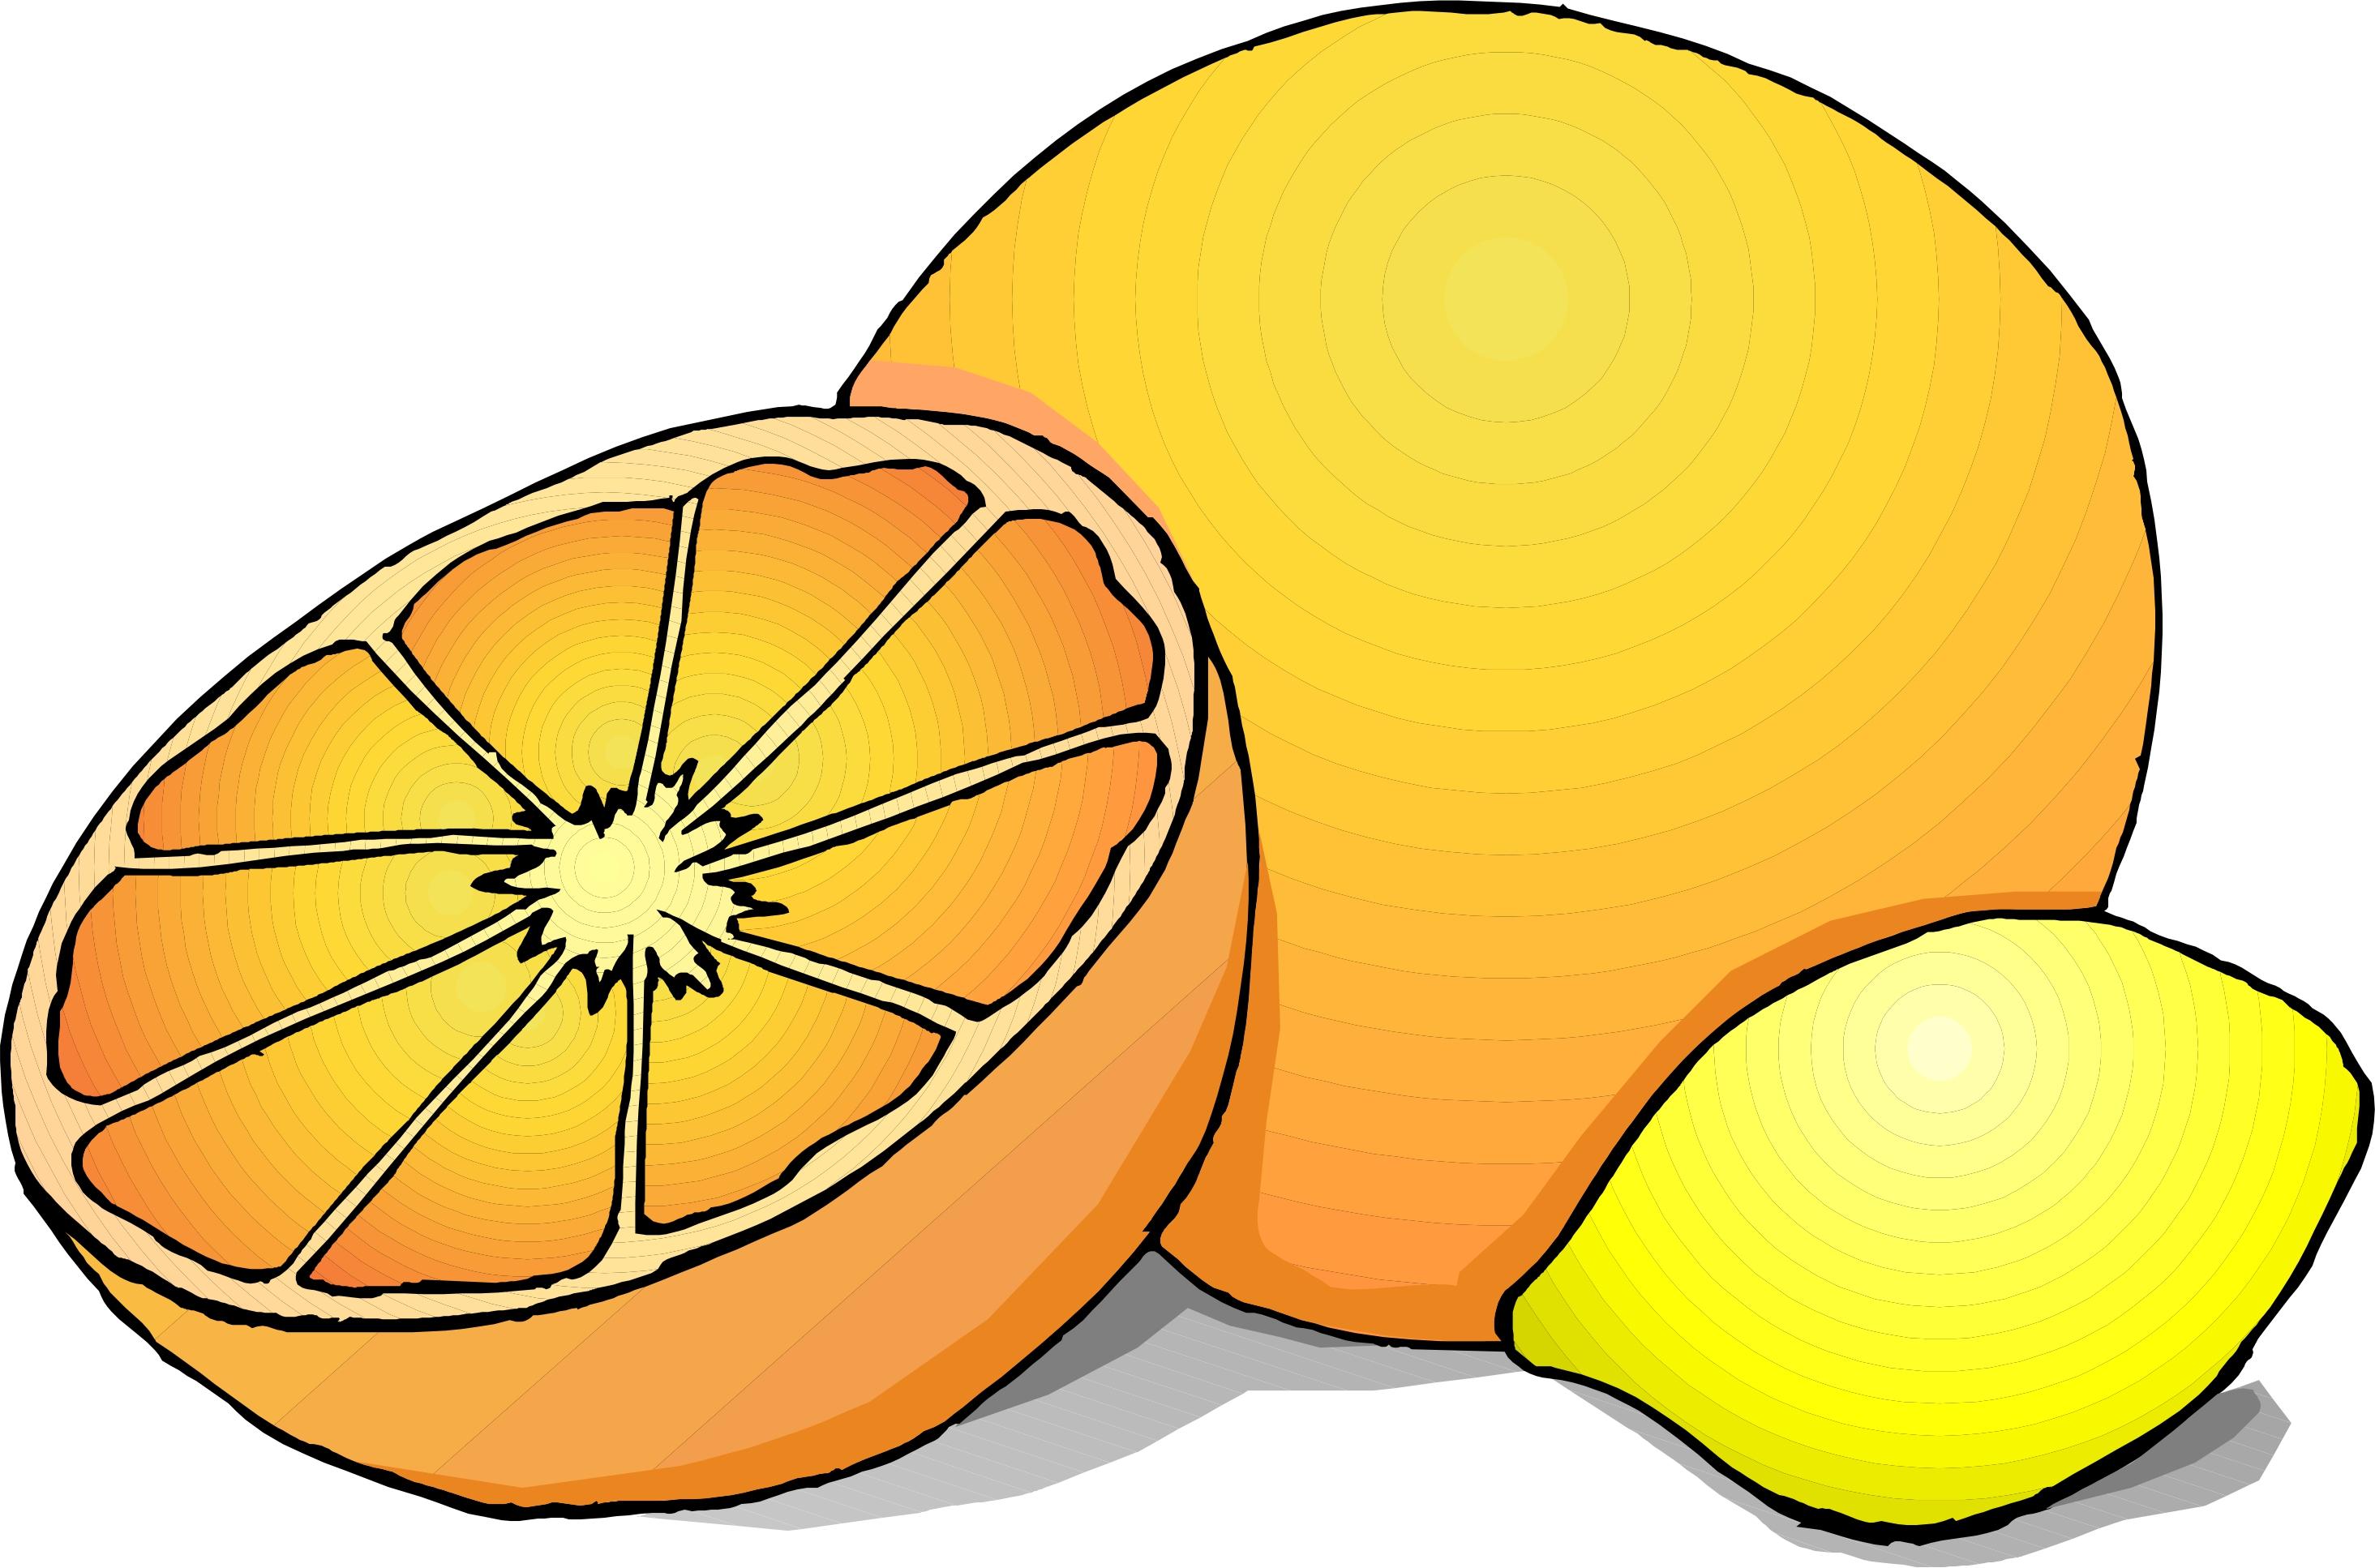 Citrus Fruit Pictures.